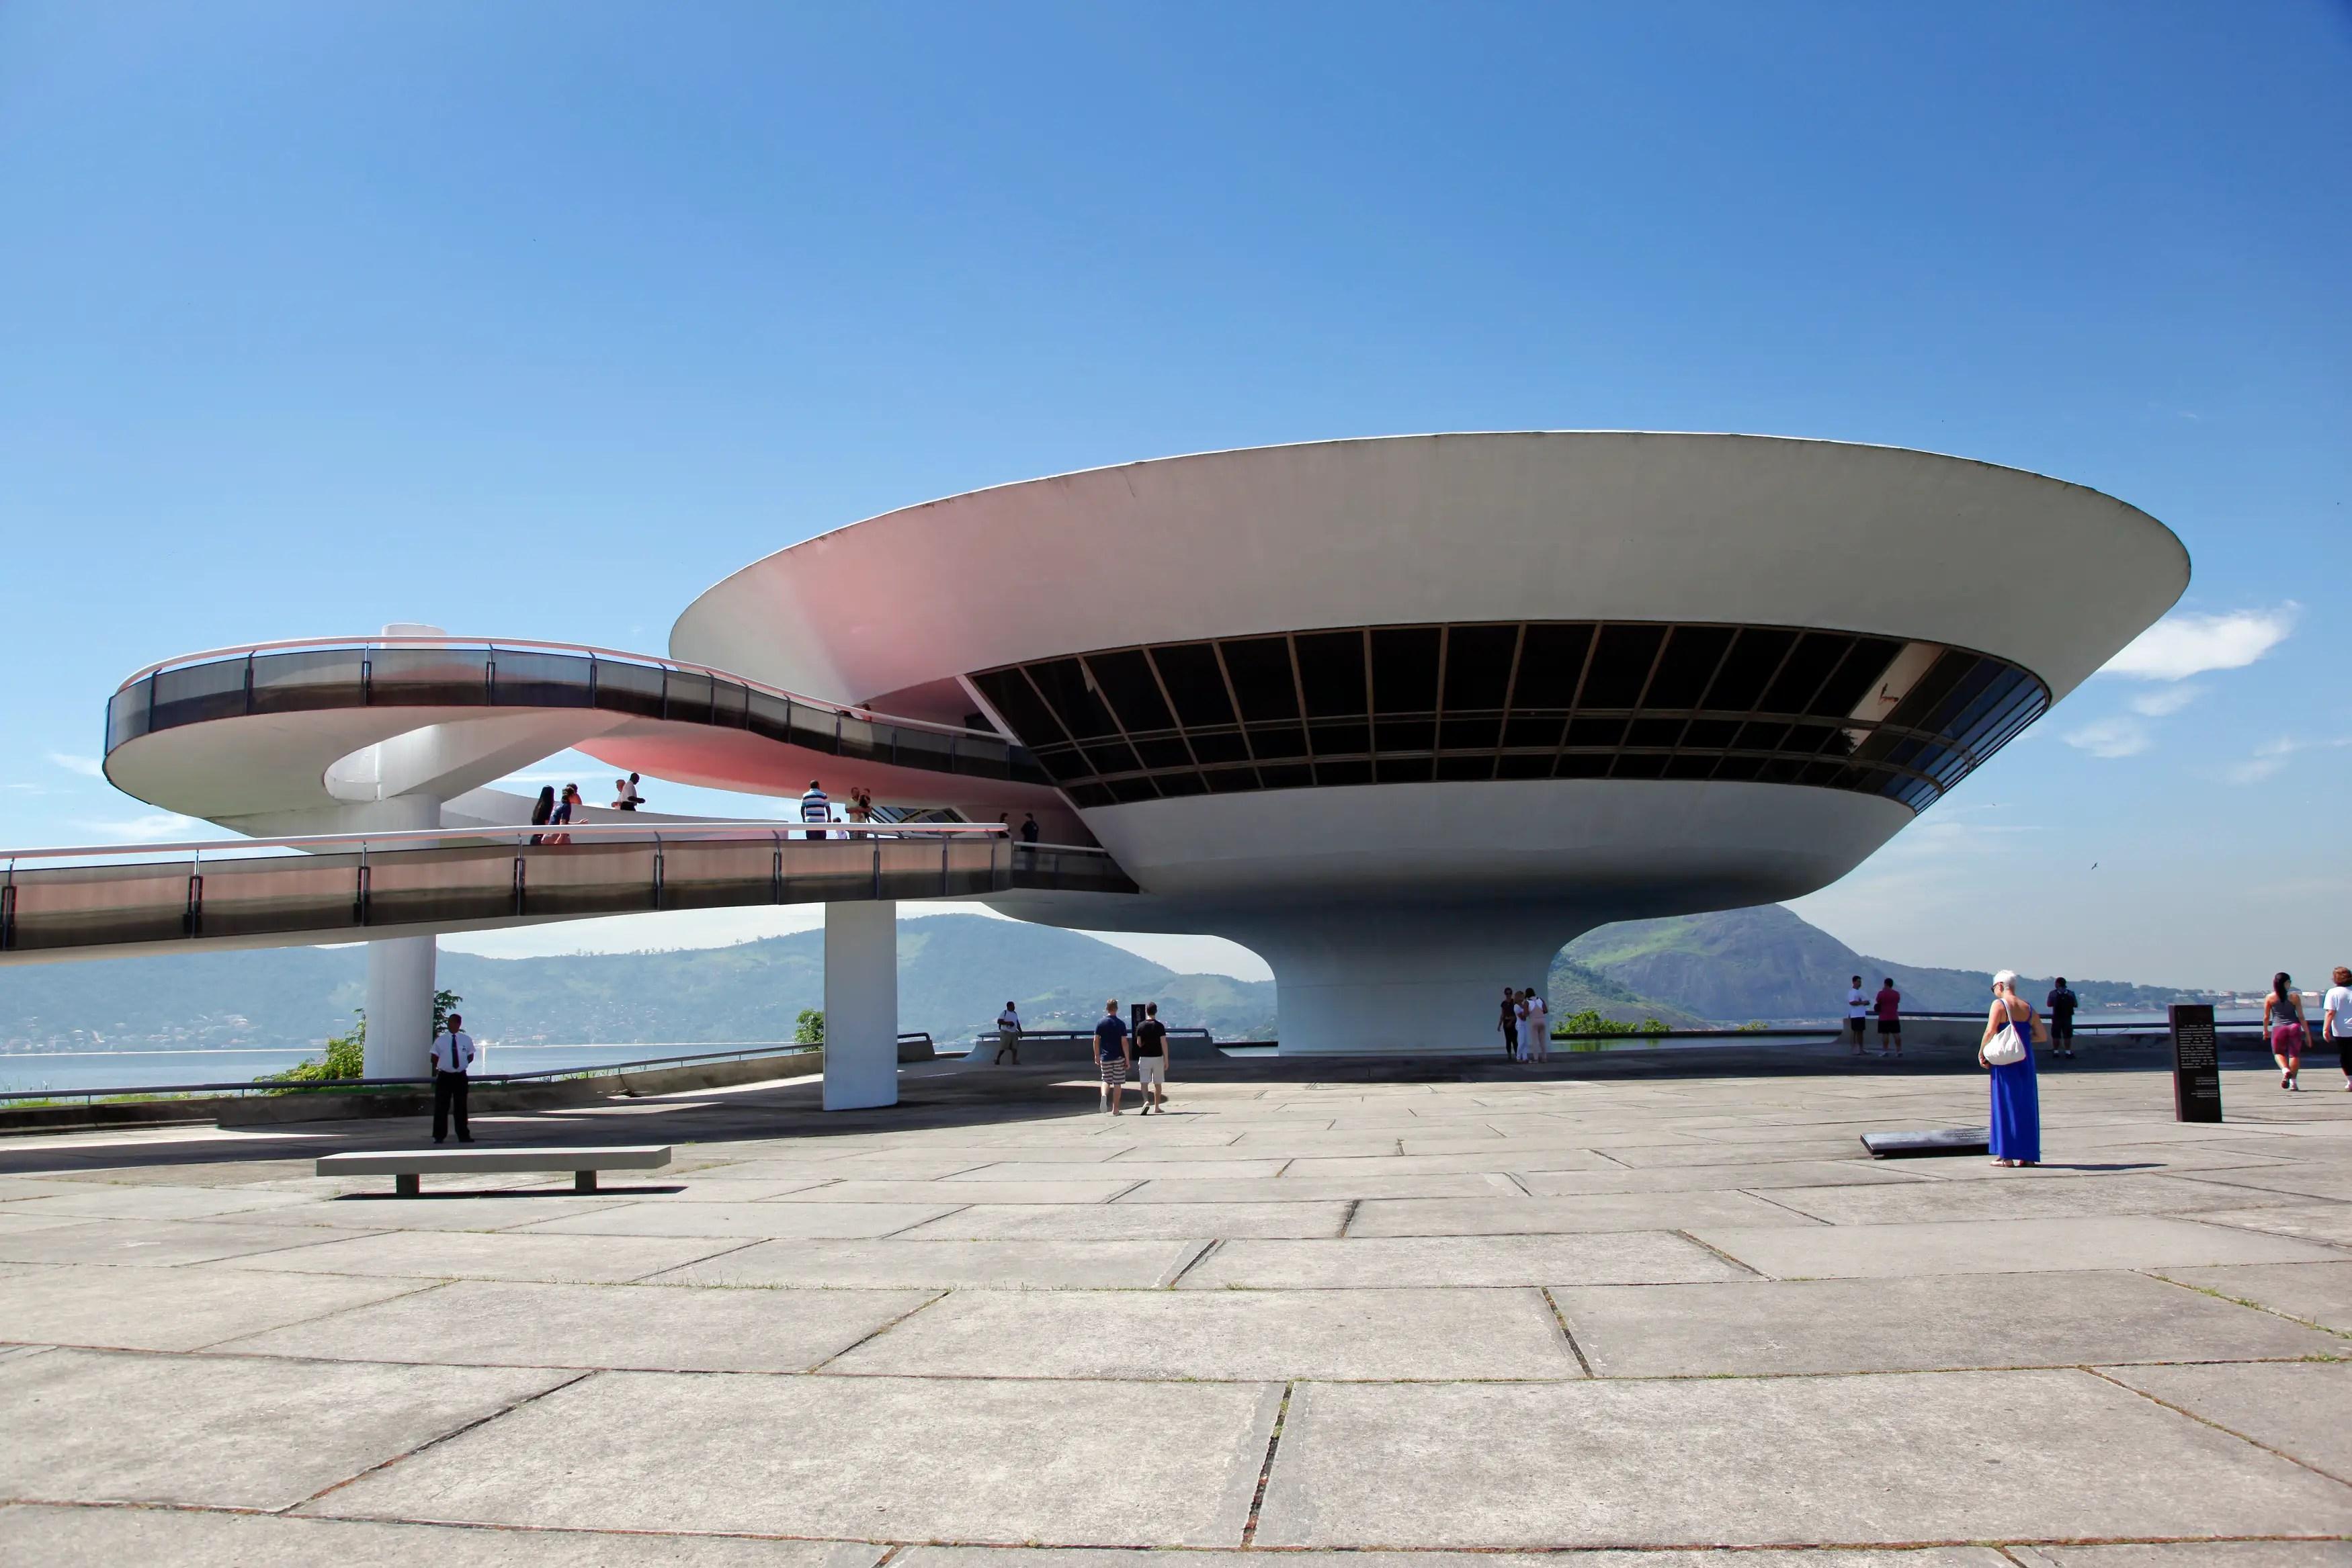 67. The Niteroi Contemporary Art Museum gives impressive panoramic views of Rio de Janiero.